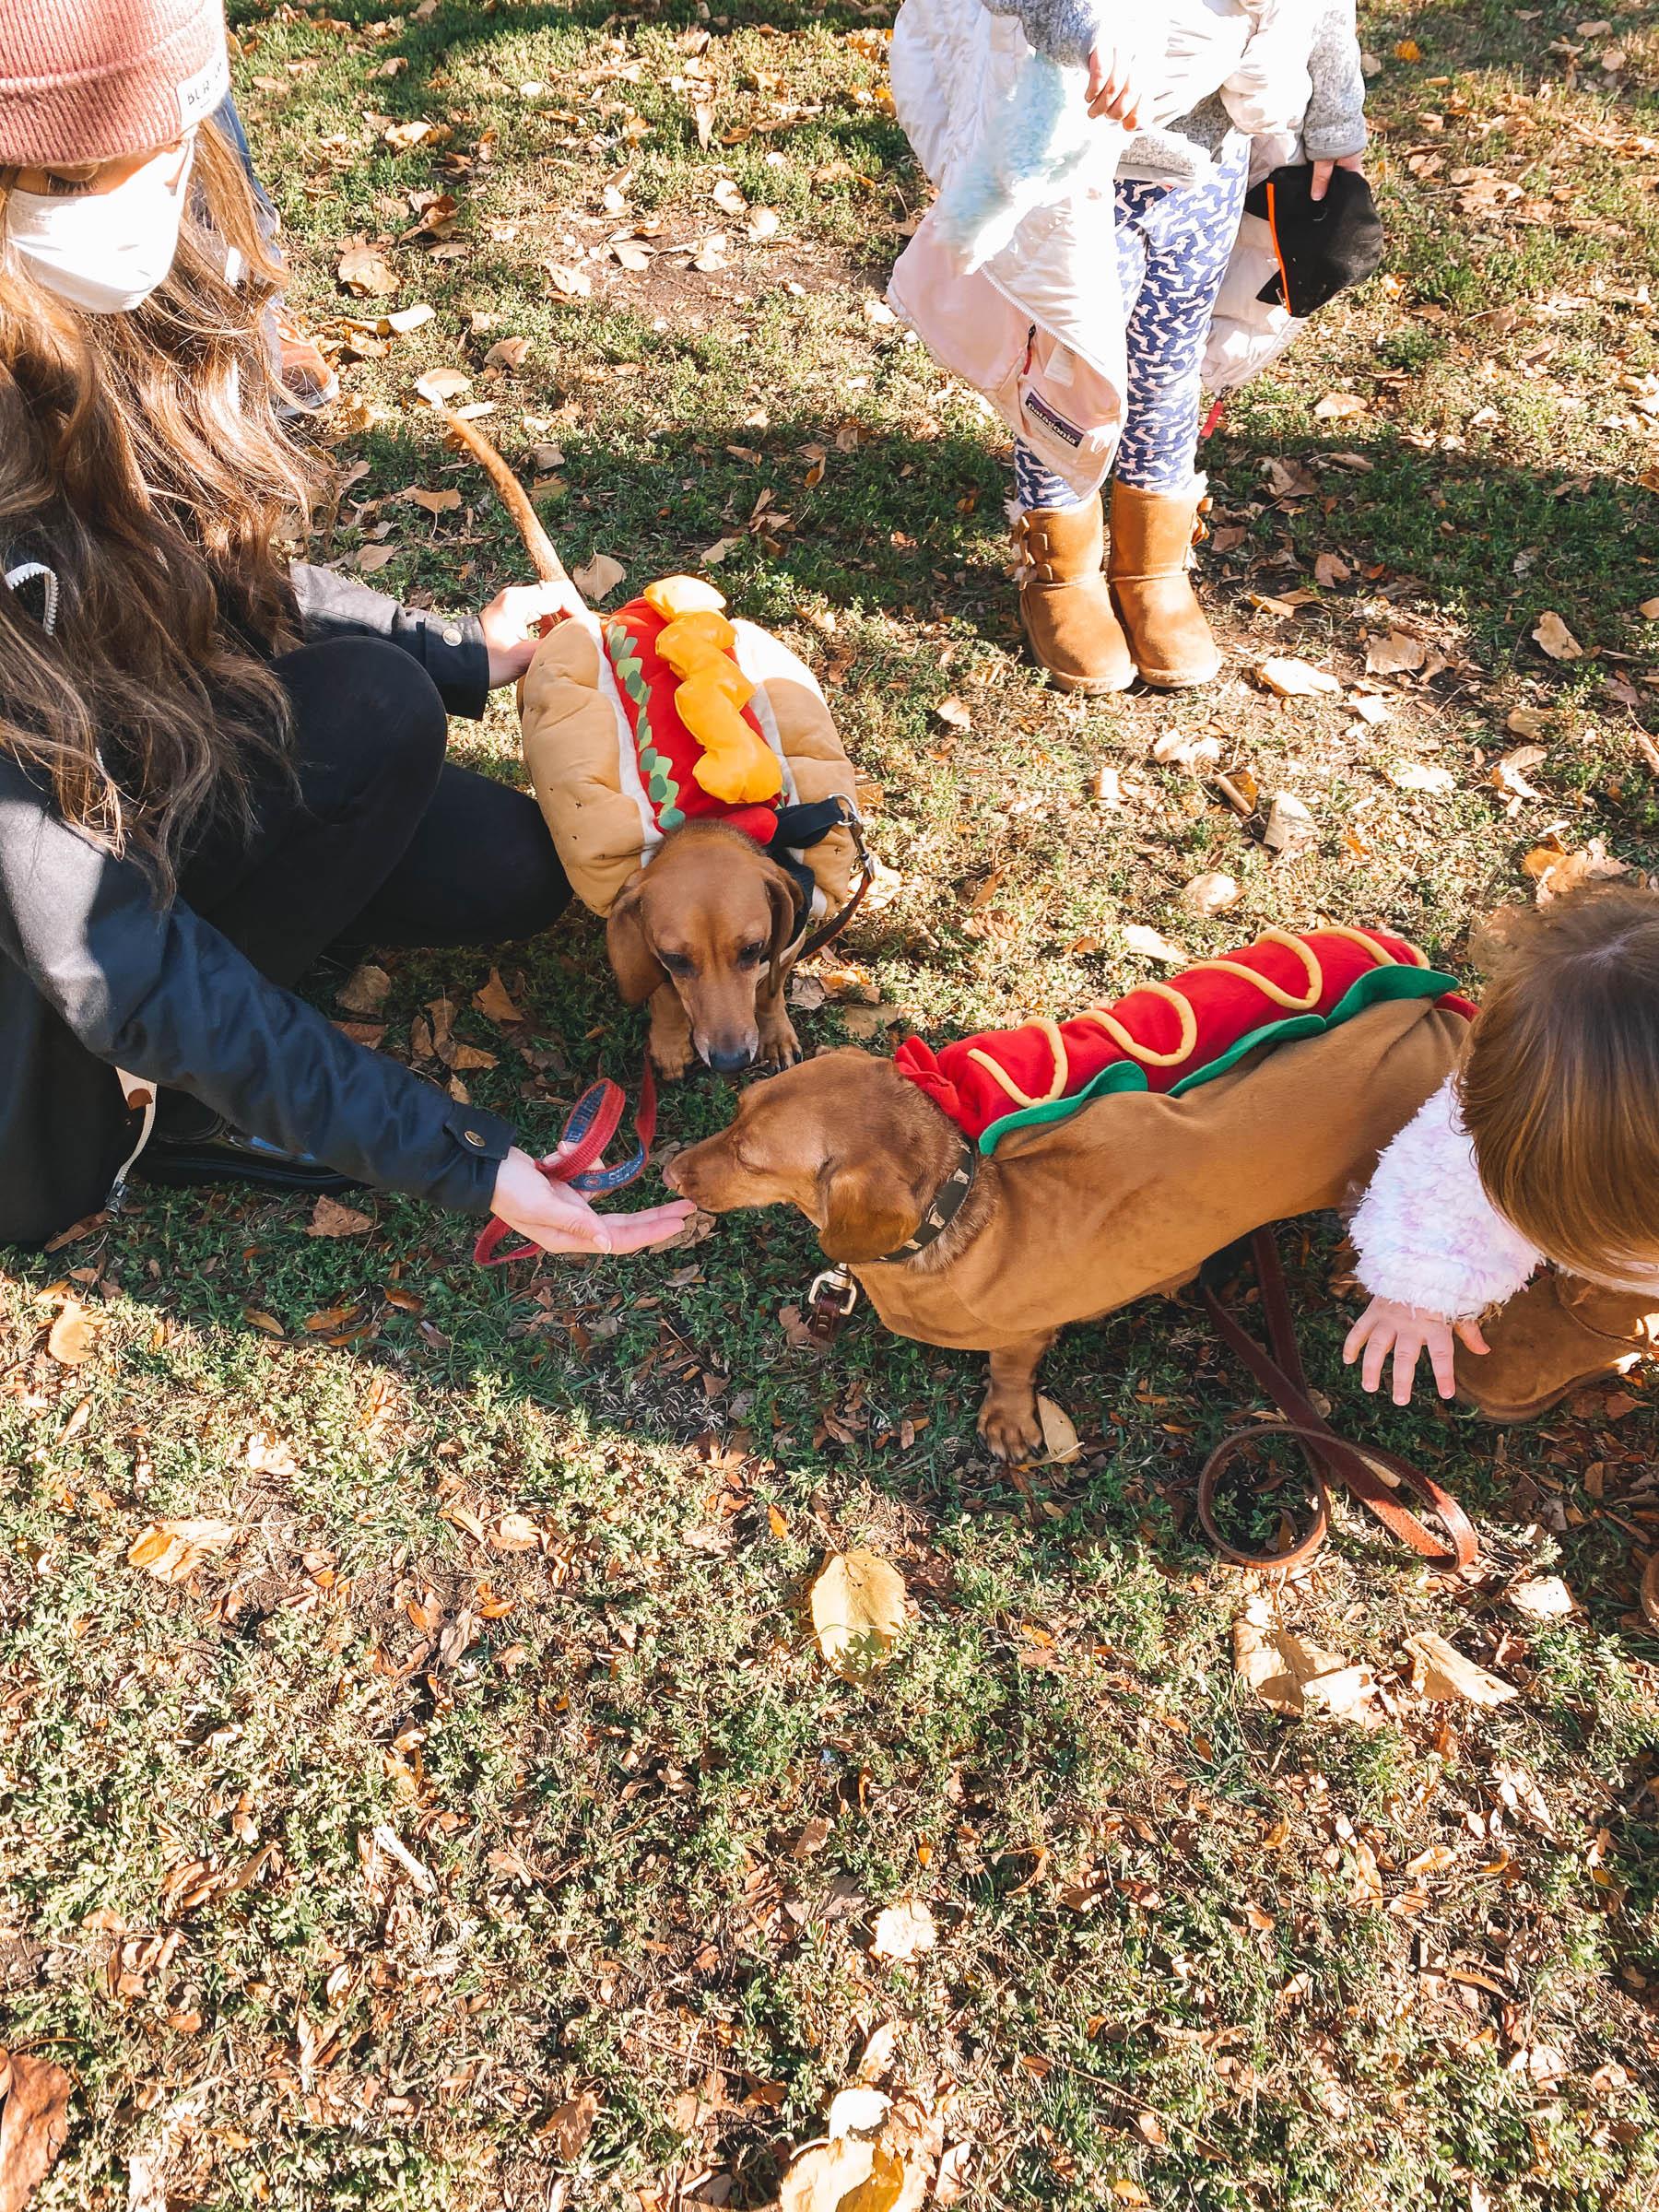 dachshund in hotdog costumes